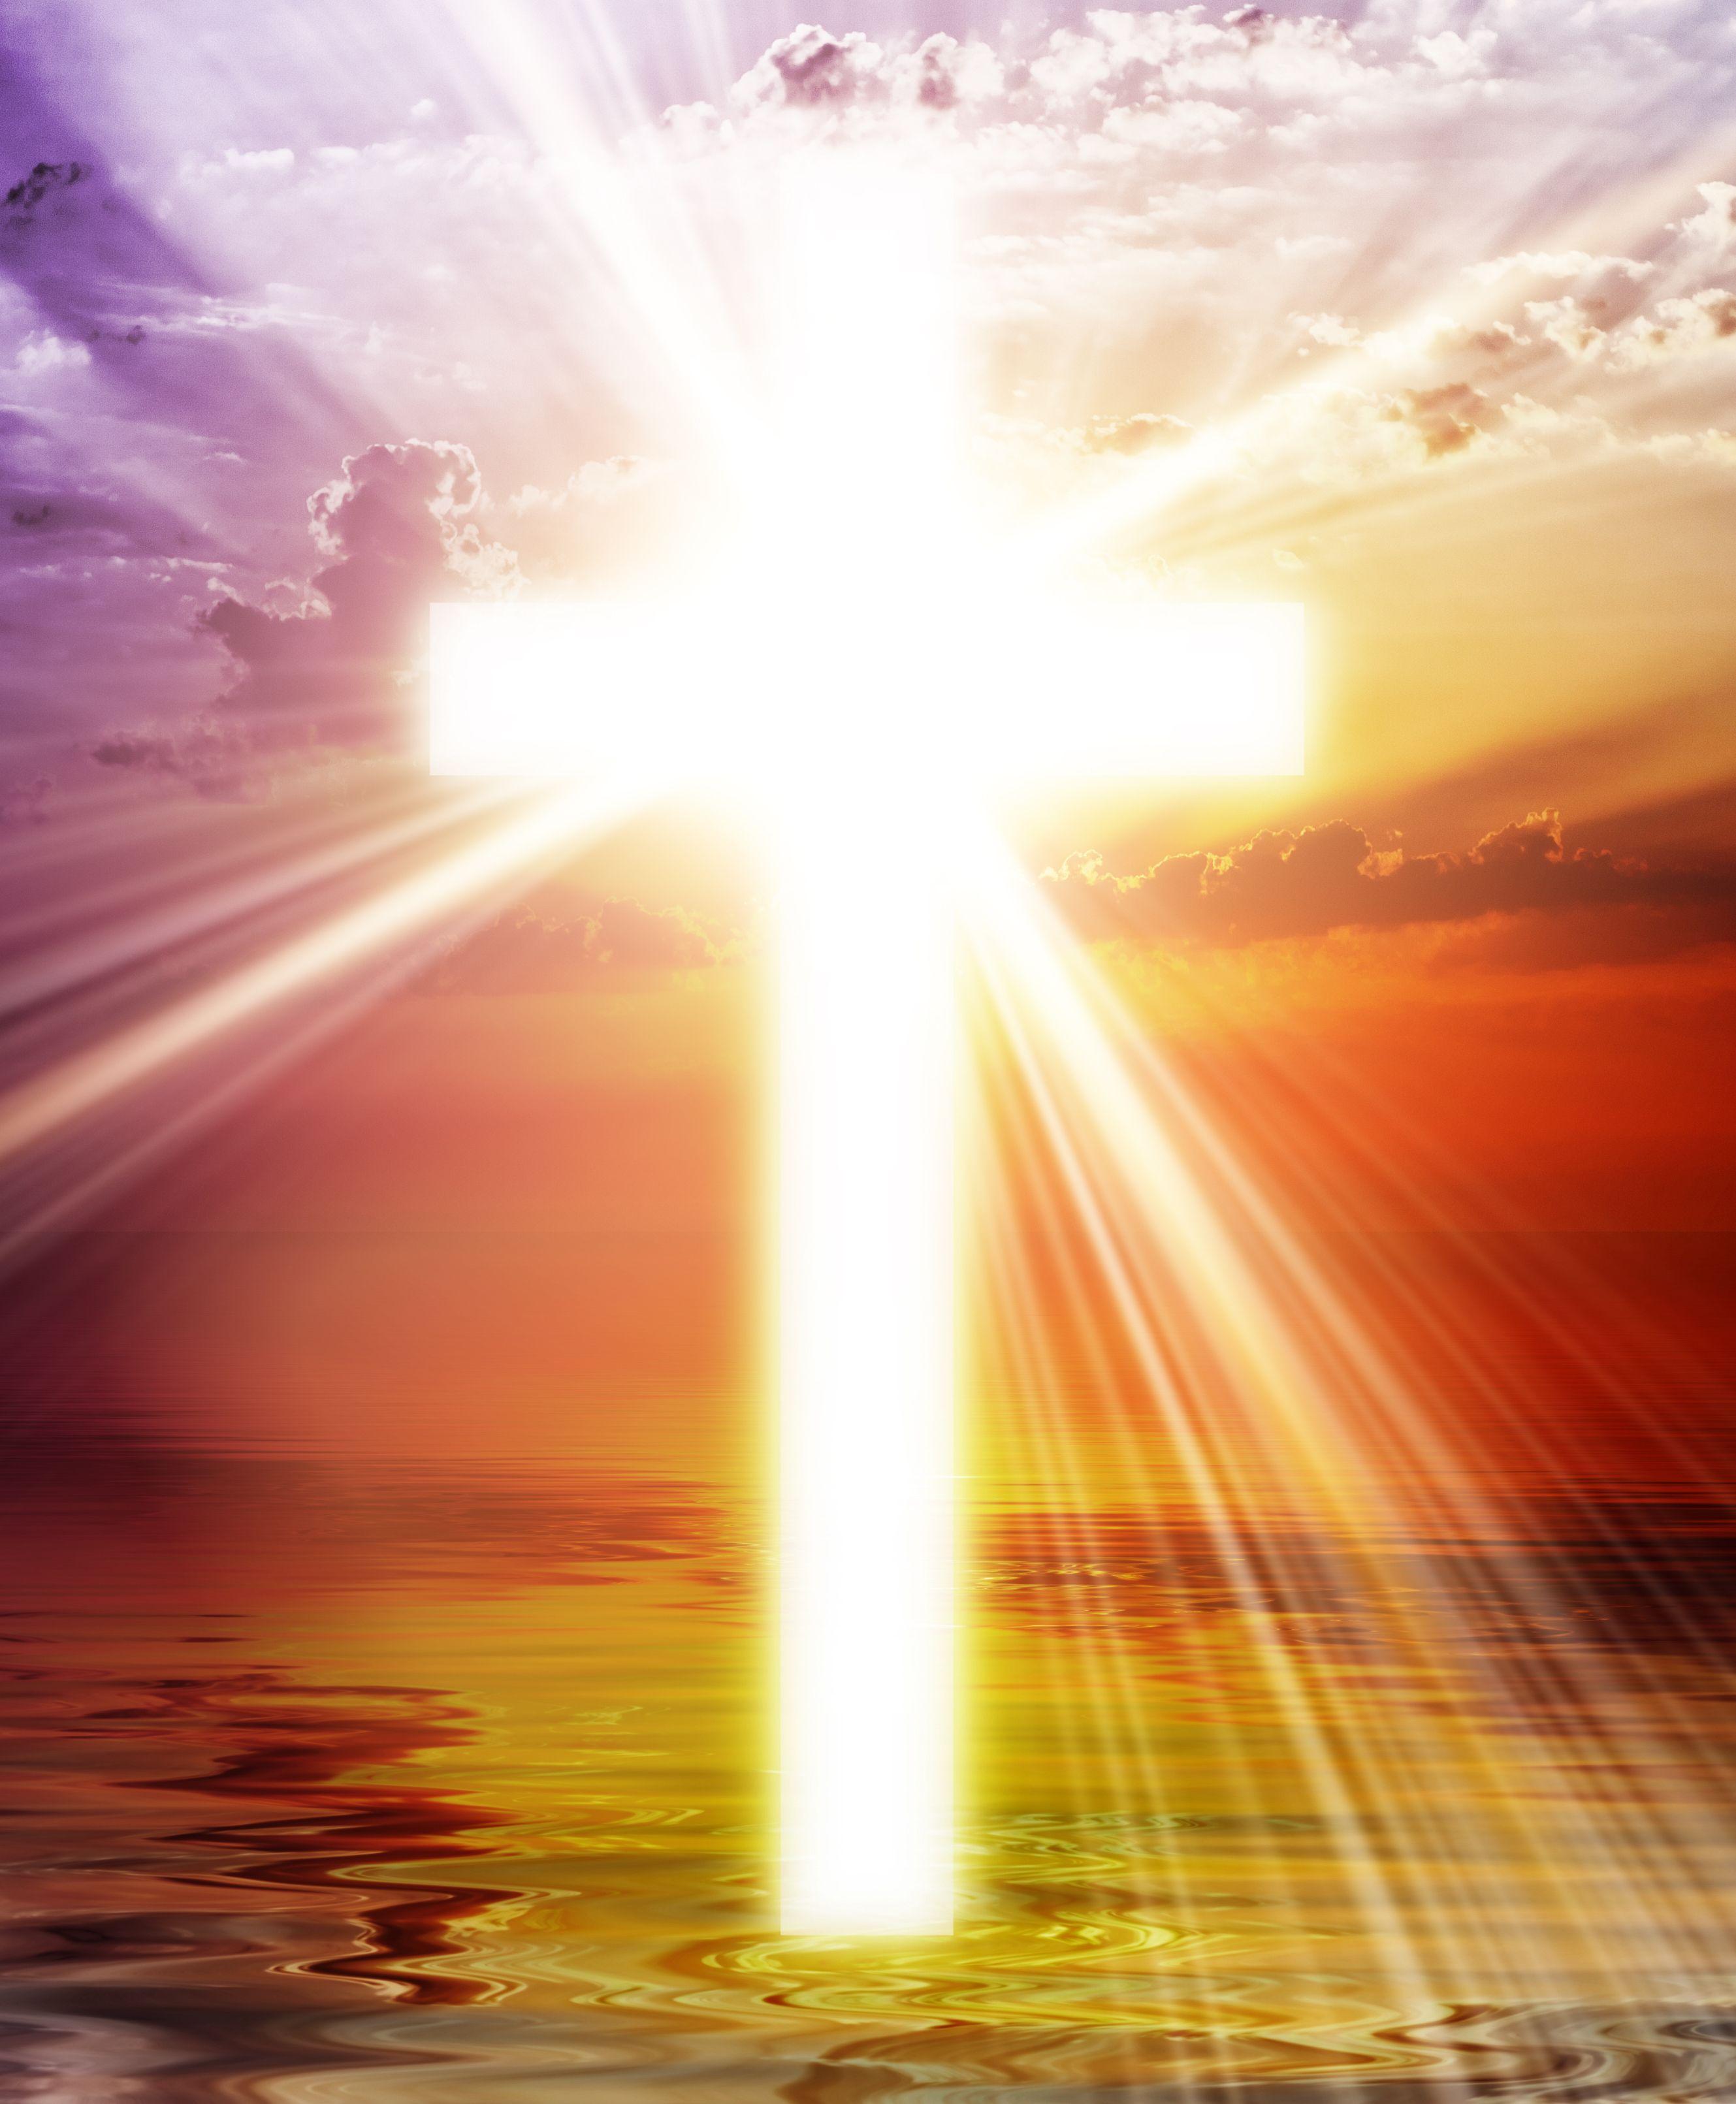 Jesus—The Light